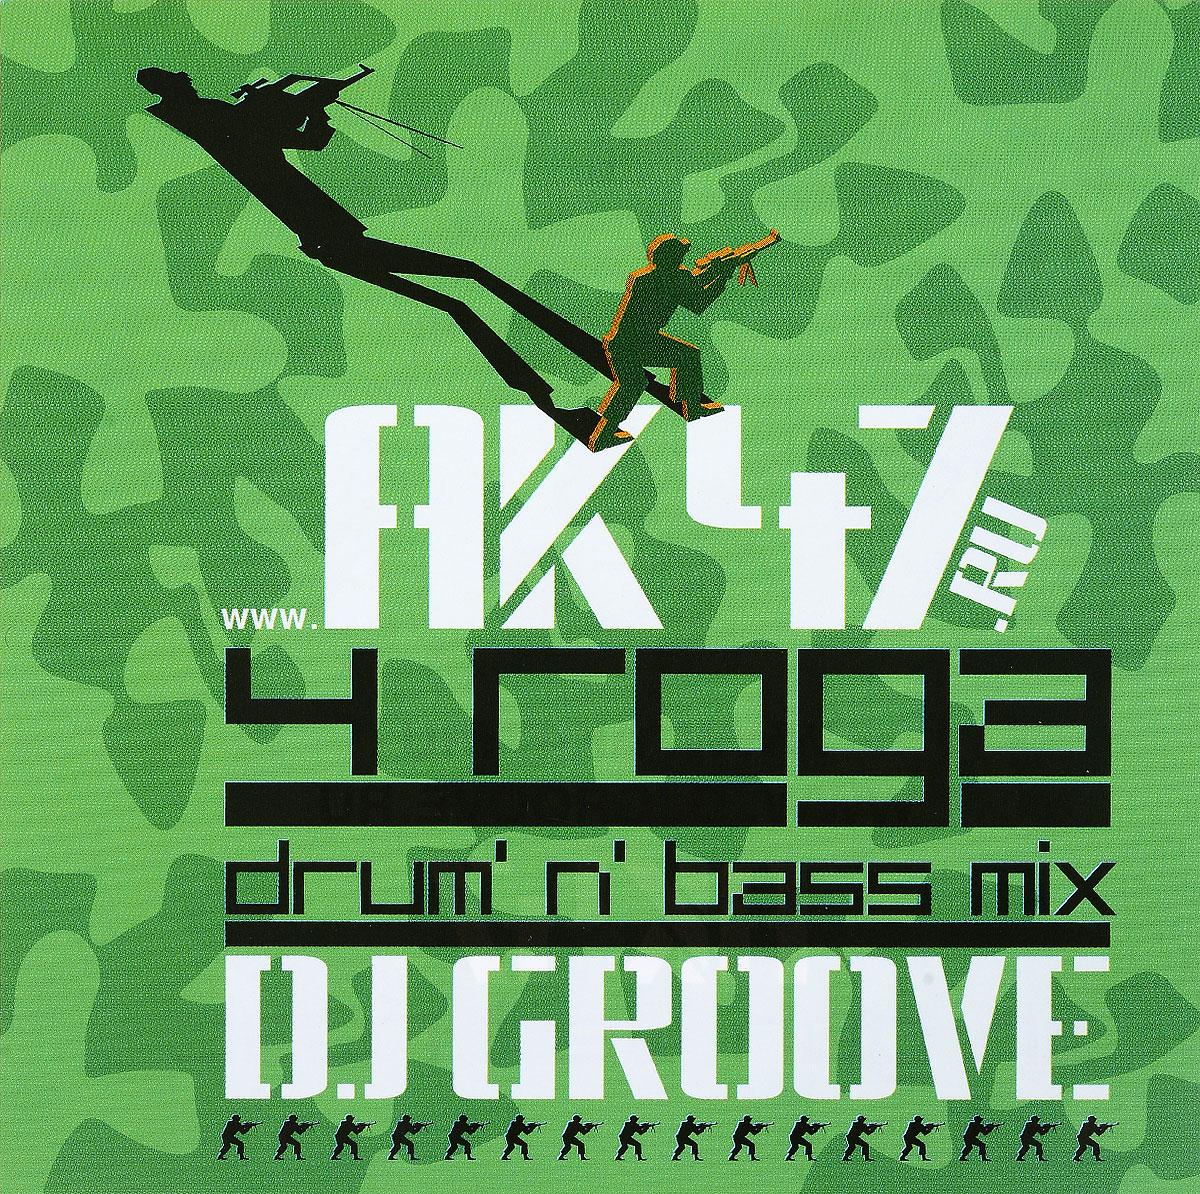 цена на DJ Грув DJ Groove DJ Groove. WWW.AK47.ru - 4 года